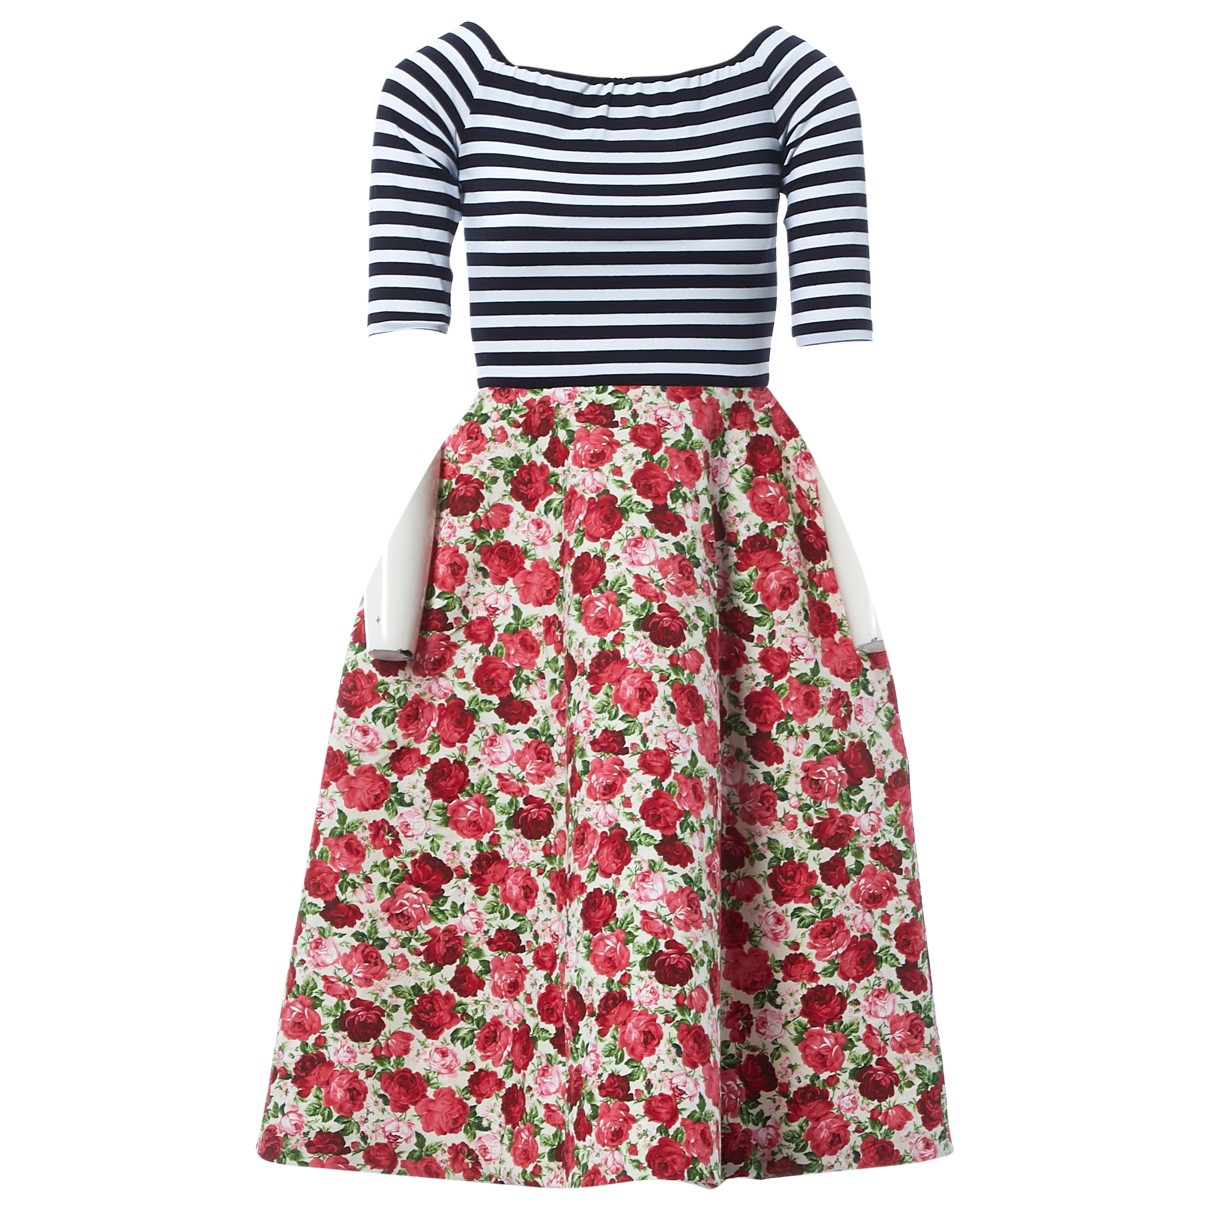 Natasha Zinko \N Kleid in  Bunt Polyester